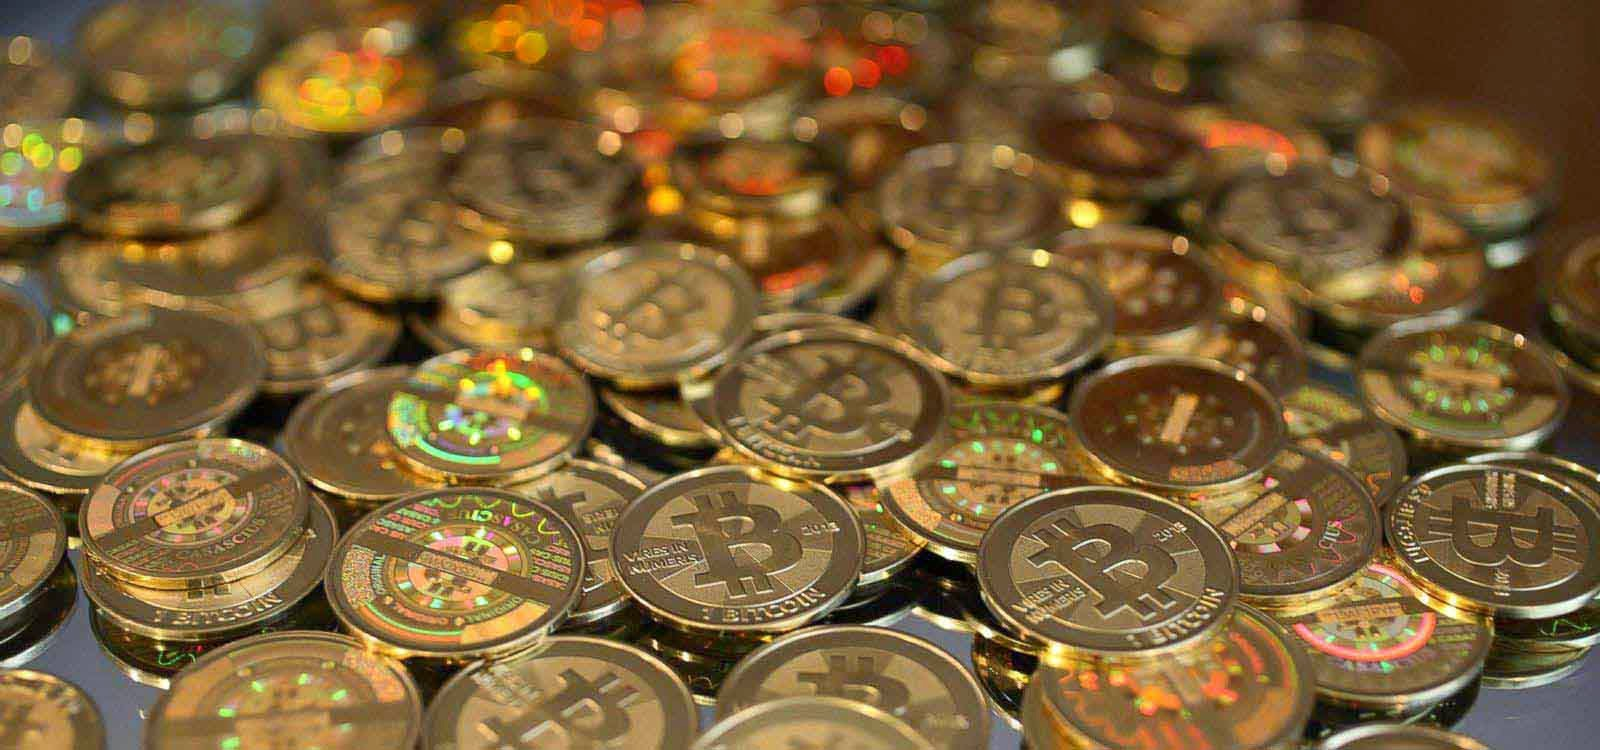 100 Bitcoins